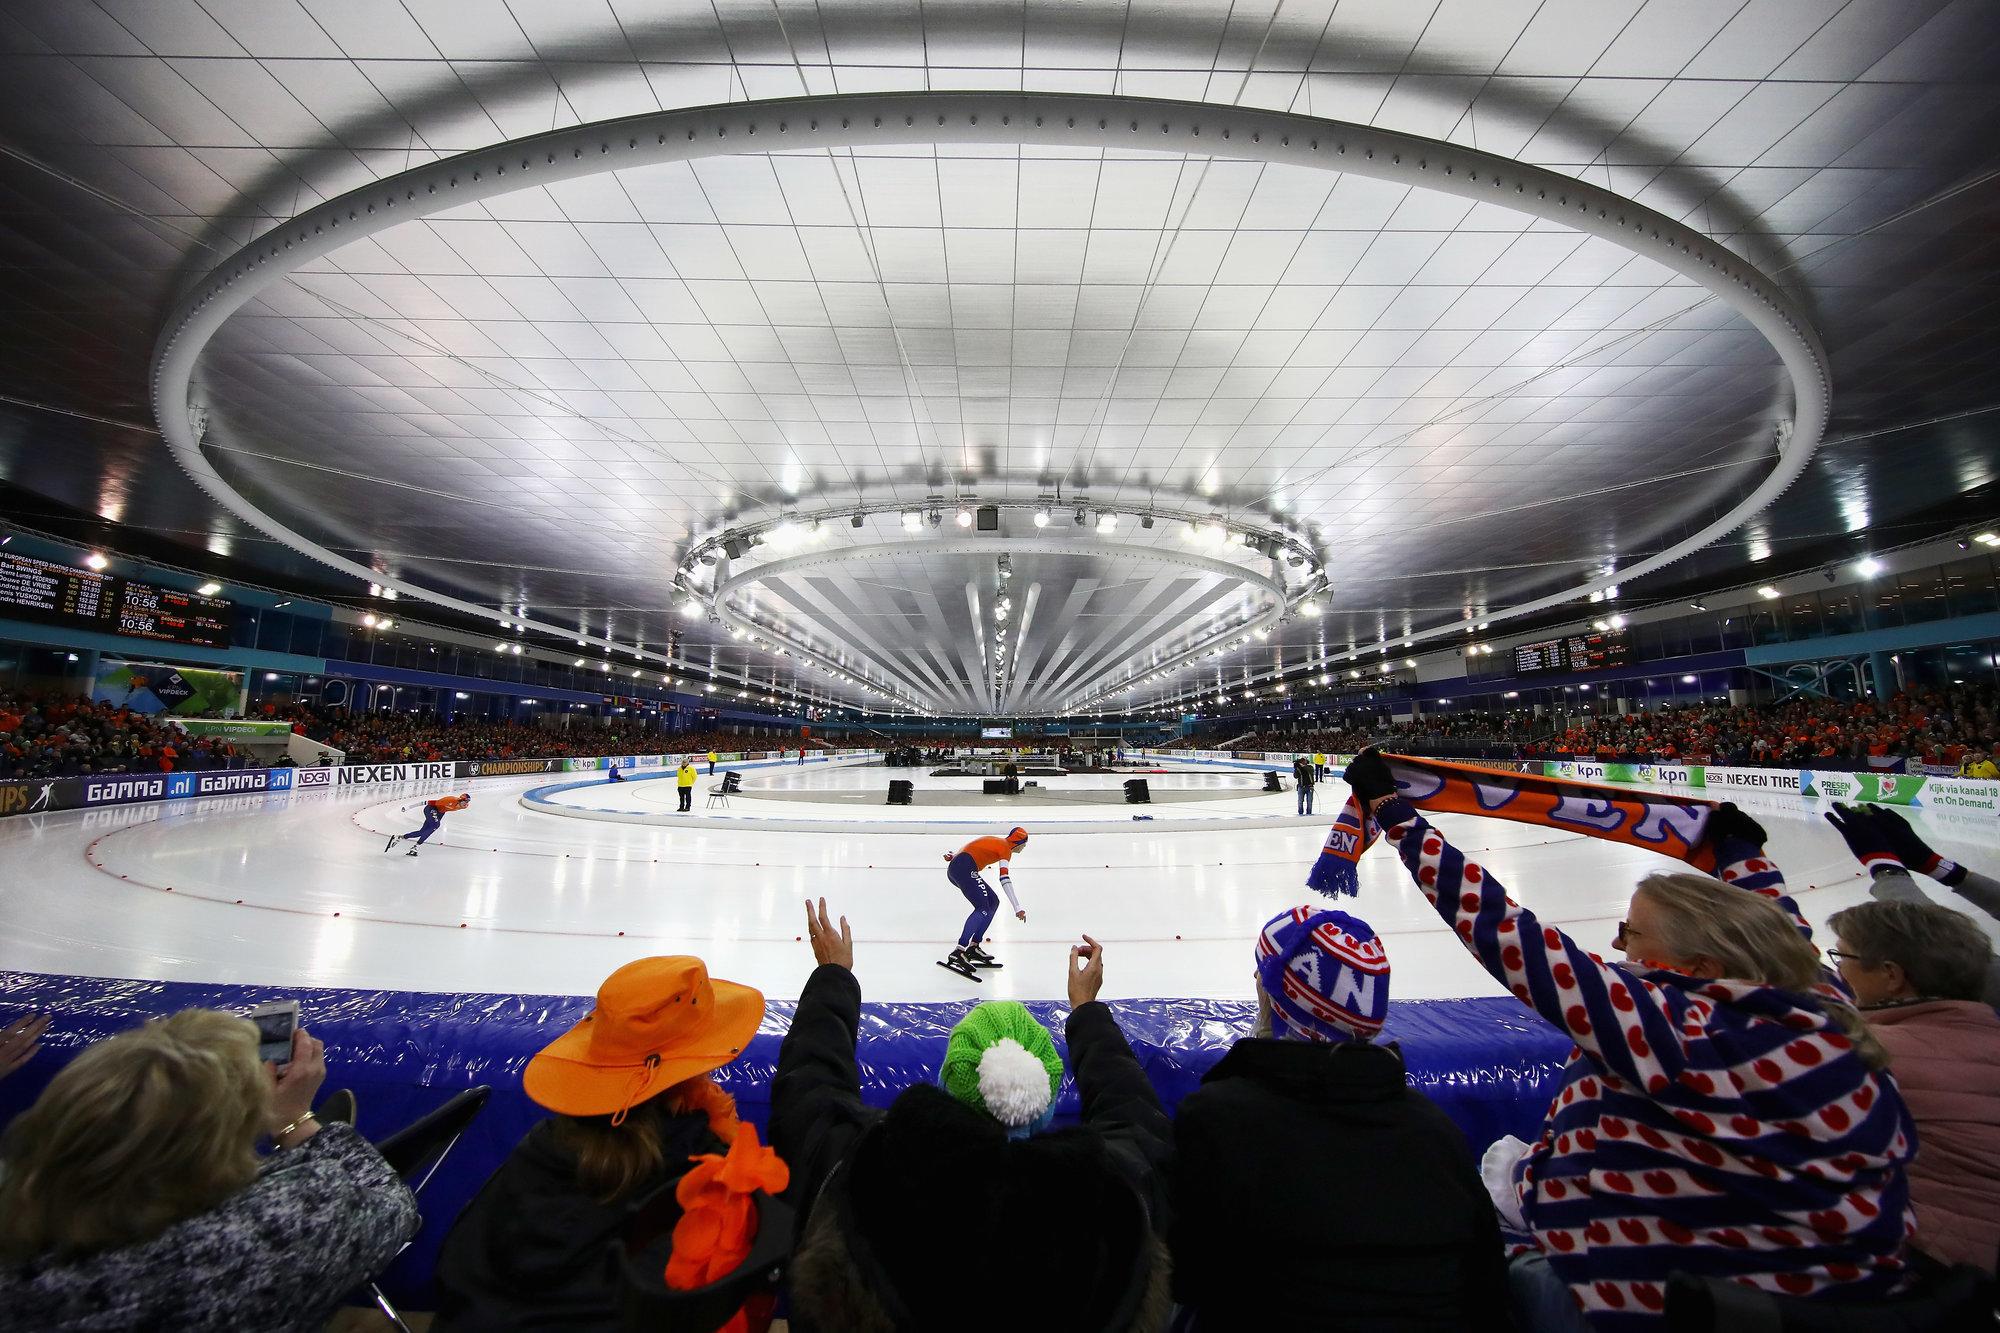 Голландский конькобежец Крамер одержал победу забег на5000м наОлимпиаде